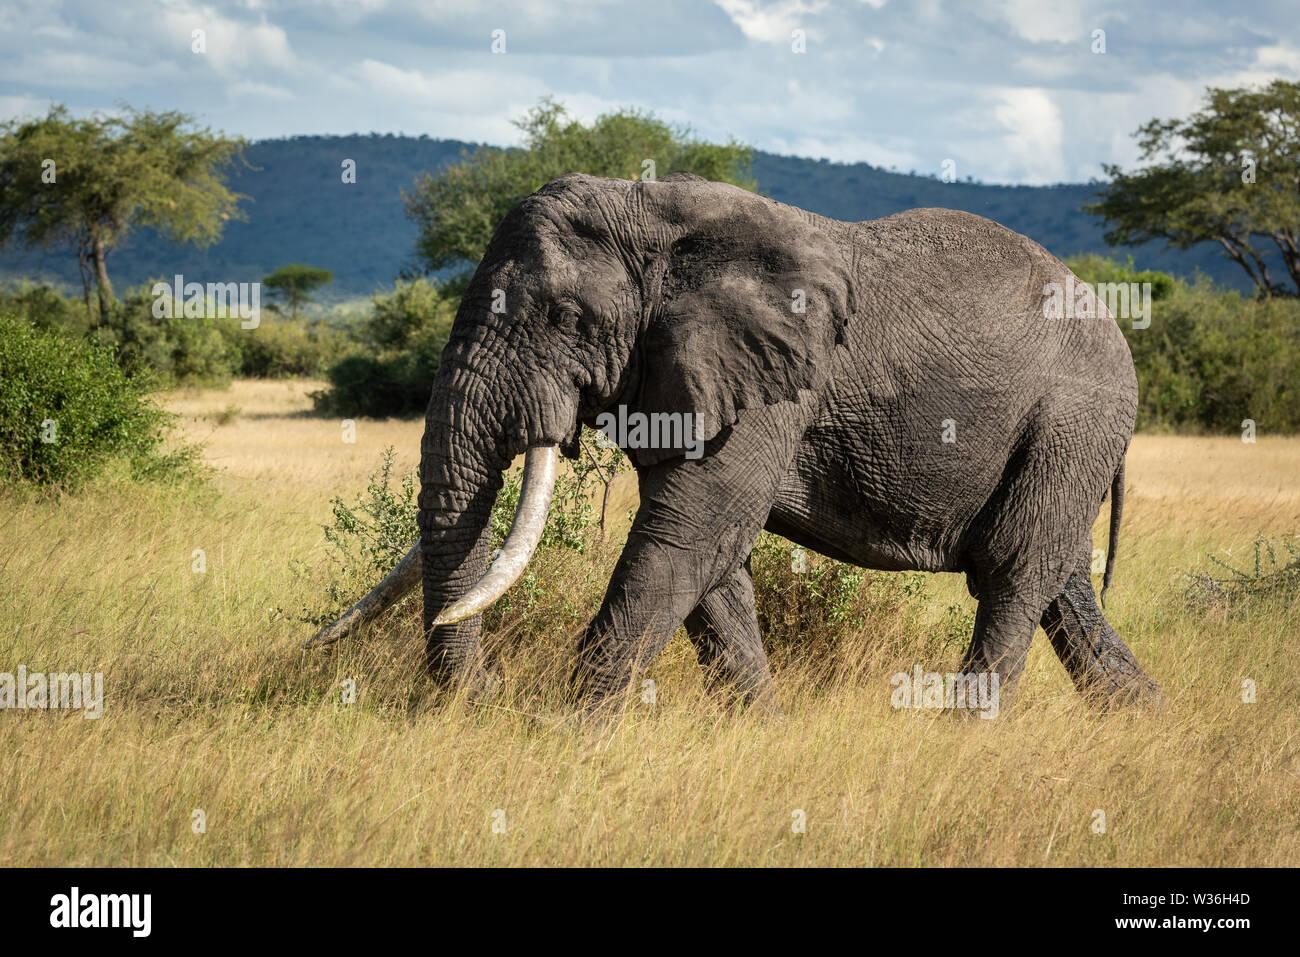 African bush elephant walking through long grass - Stock Image